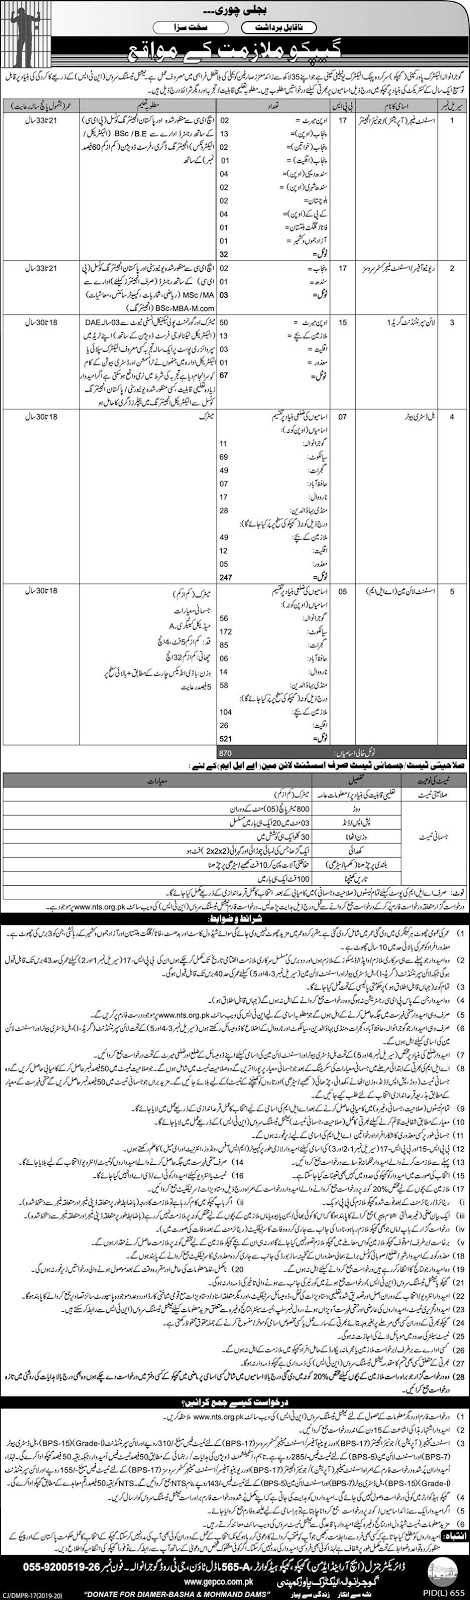 Latest NTS Jobs In Gujranwala Electric Power Company (GEPCO) WAPDA